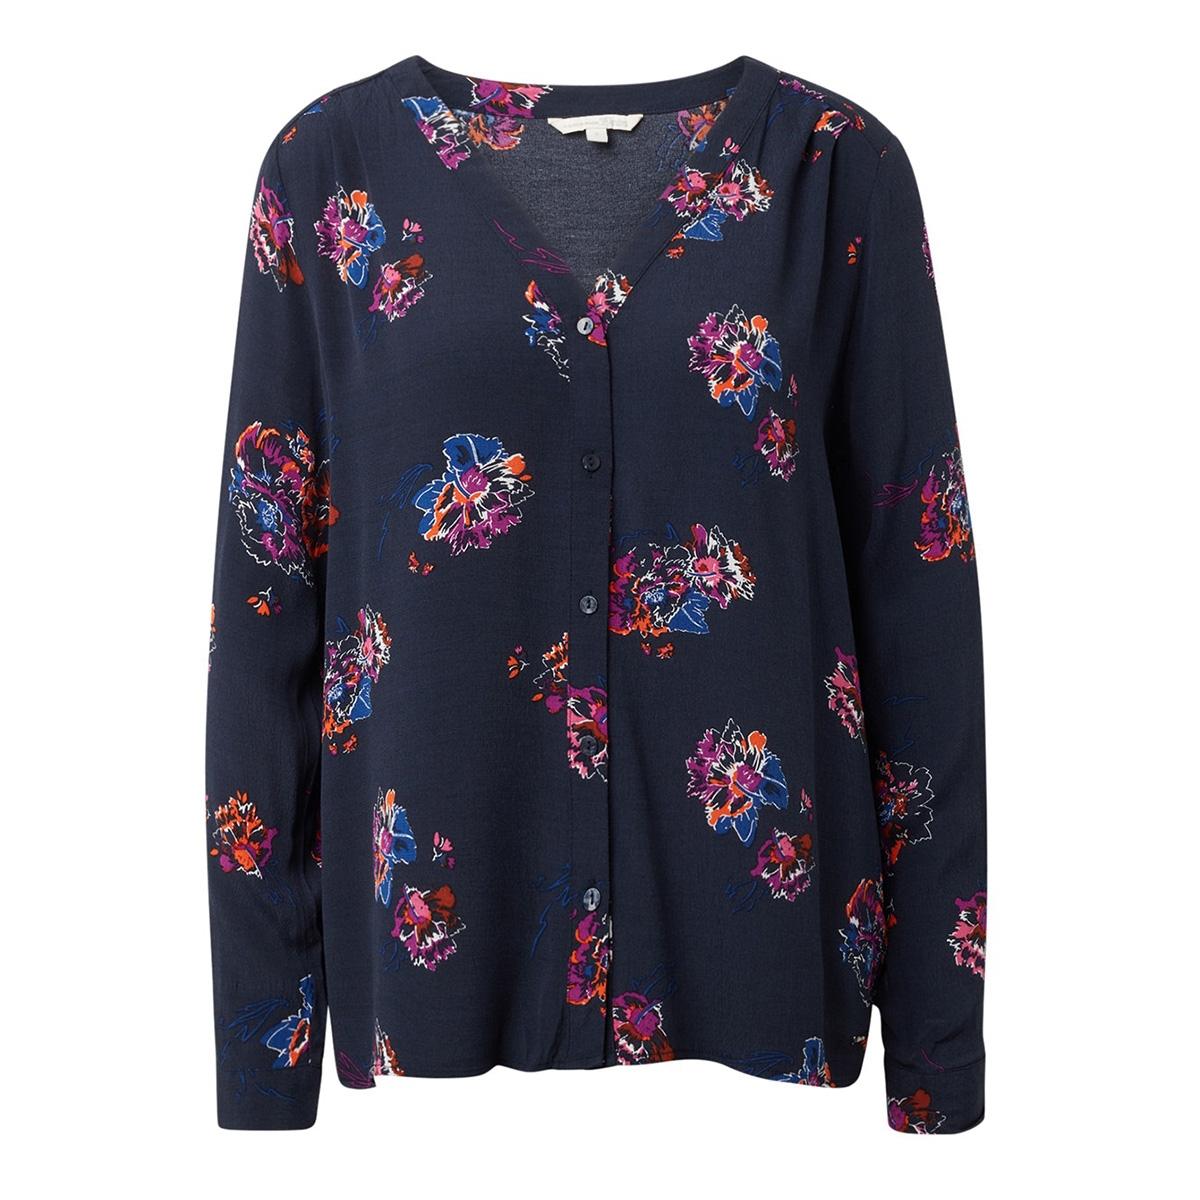 blouse gemaakt van viscose crepe 1014674xx71 tom tailor blouse 20671